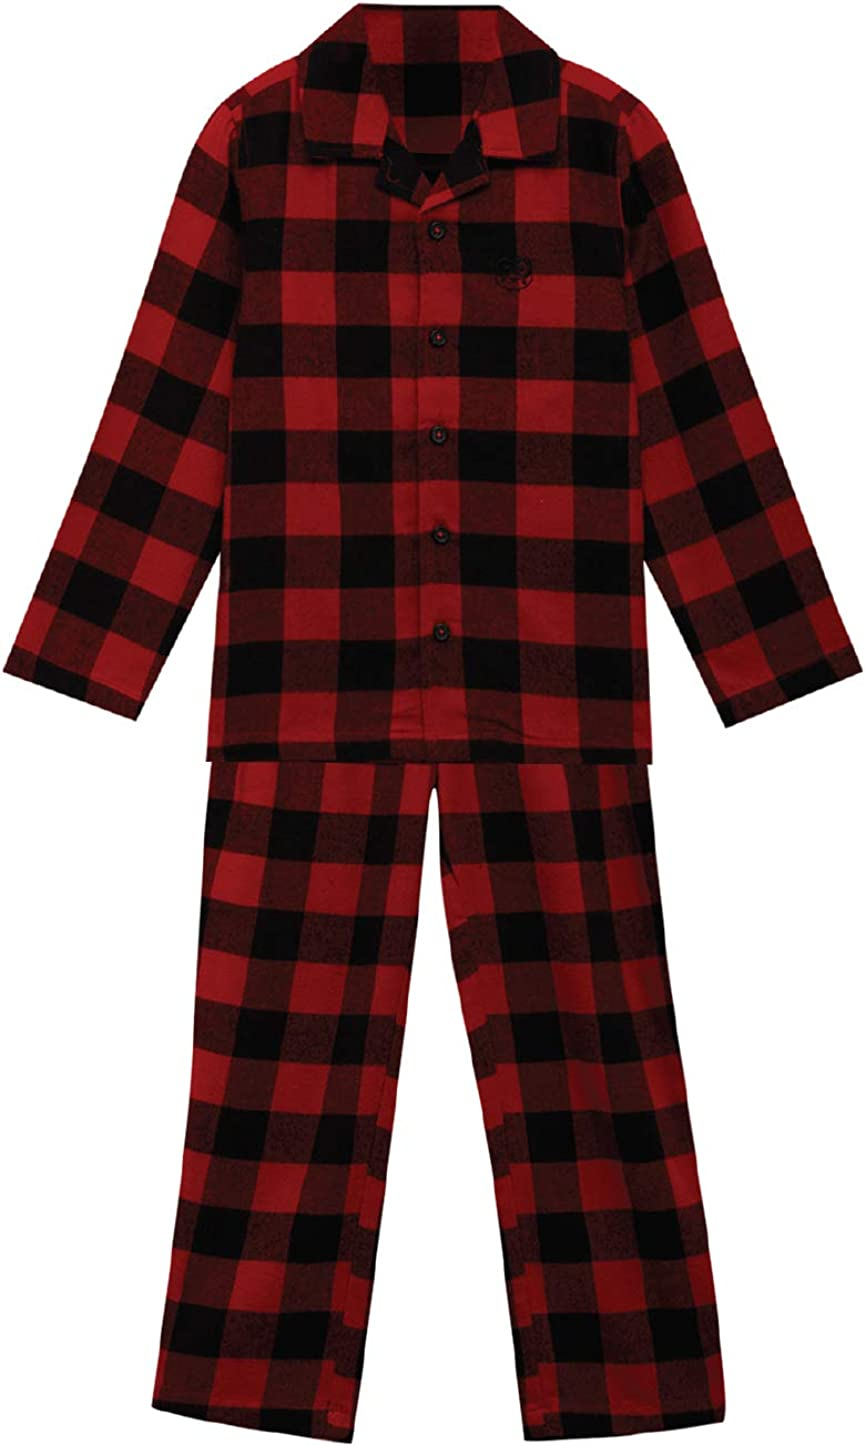 Under Fourteen Only Child Unisex Cotton Night Suit Red Flannel Check (12-13 YRS)